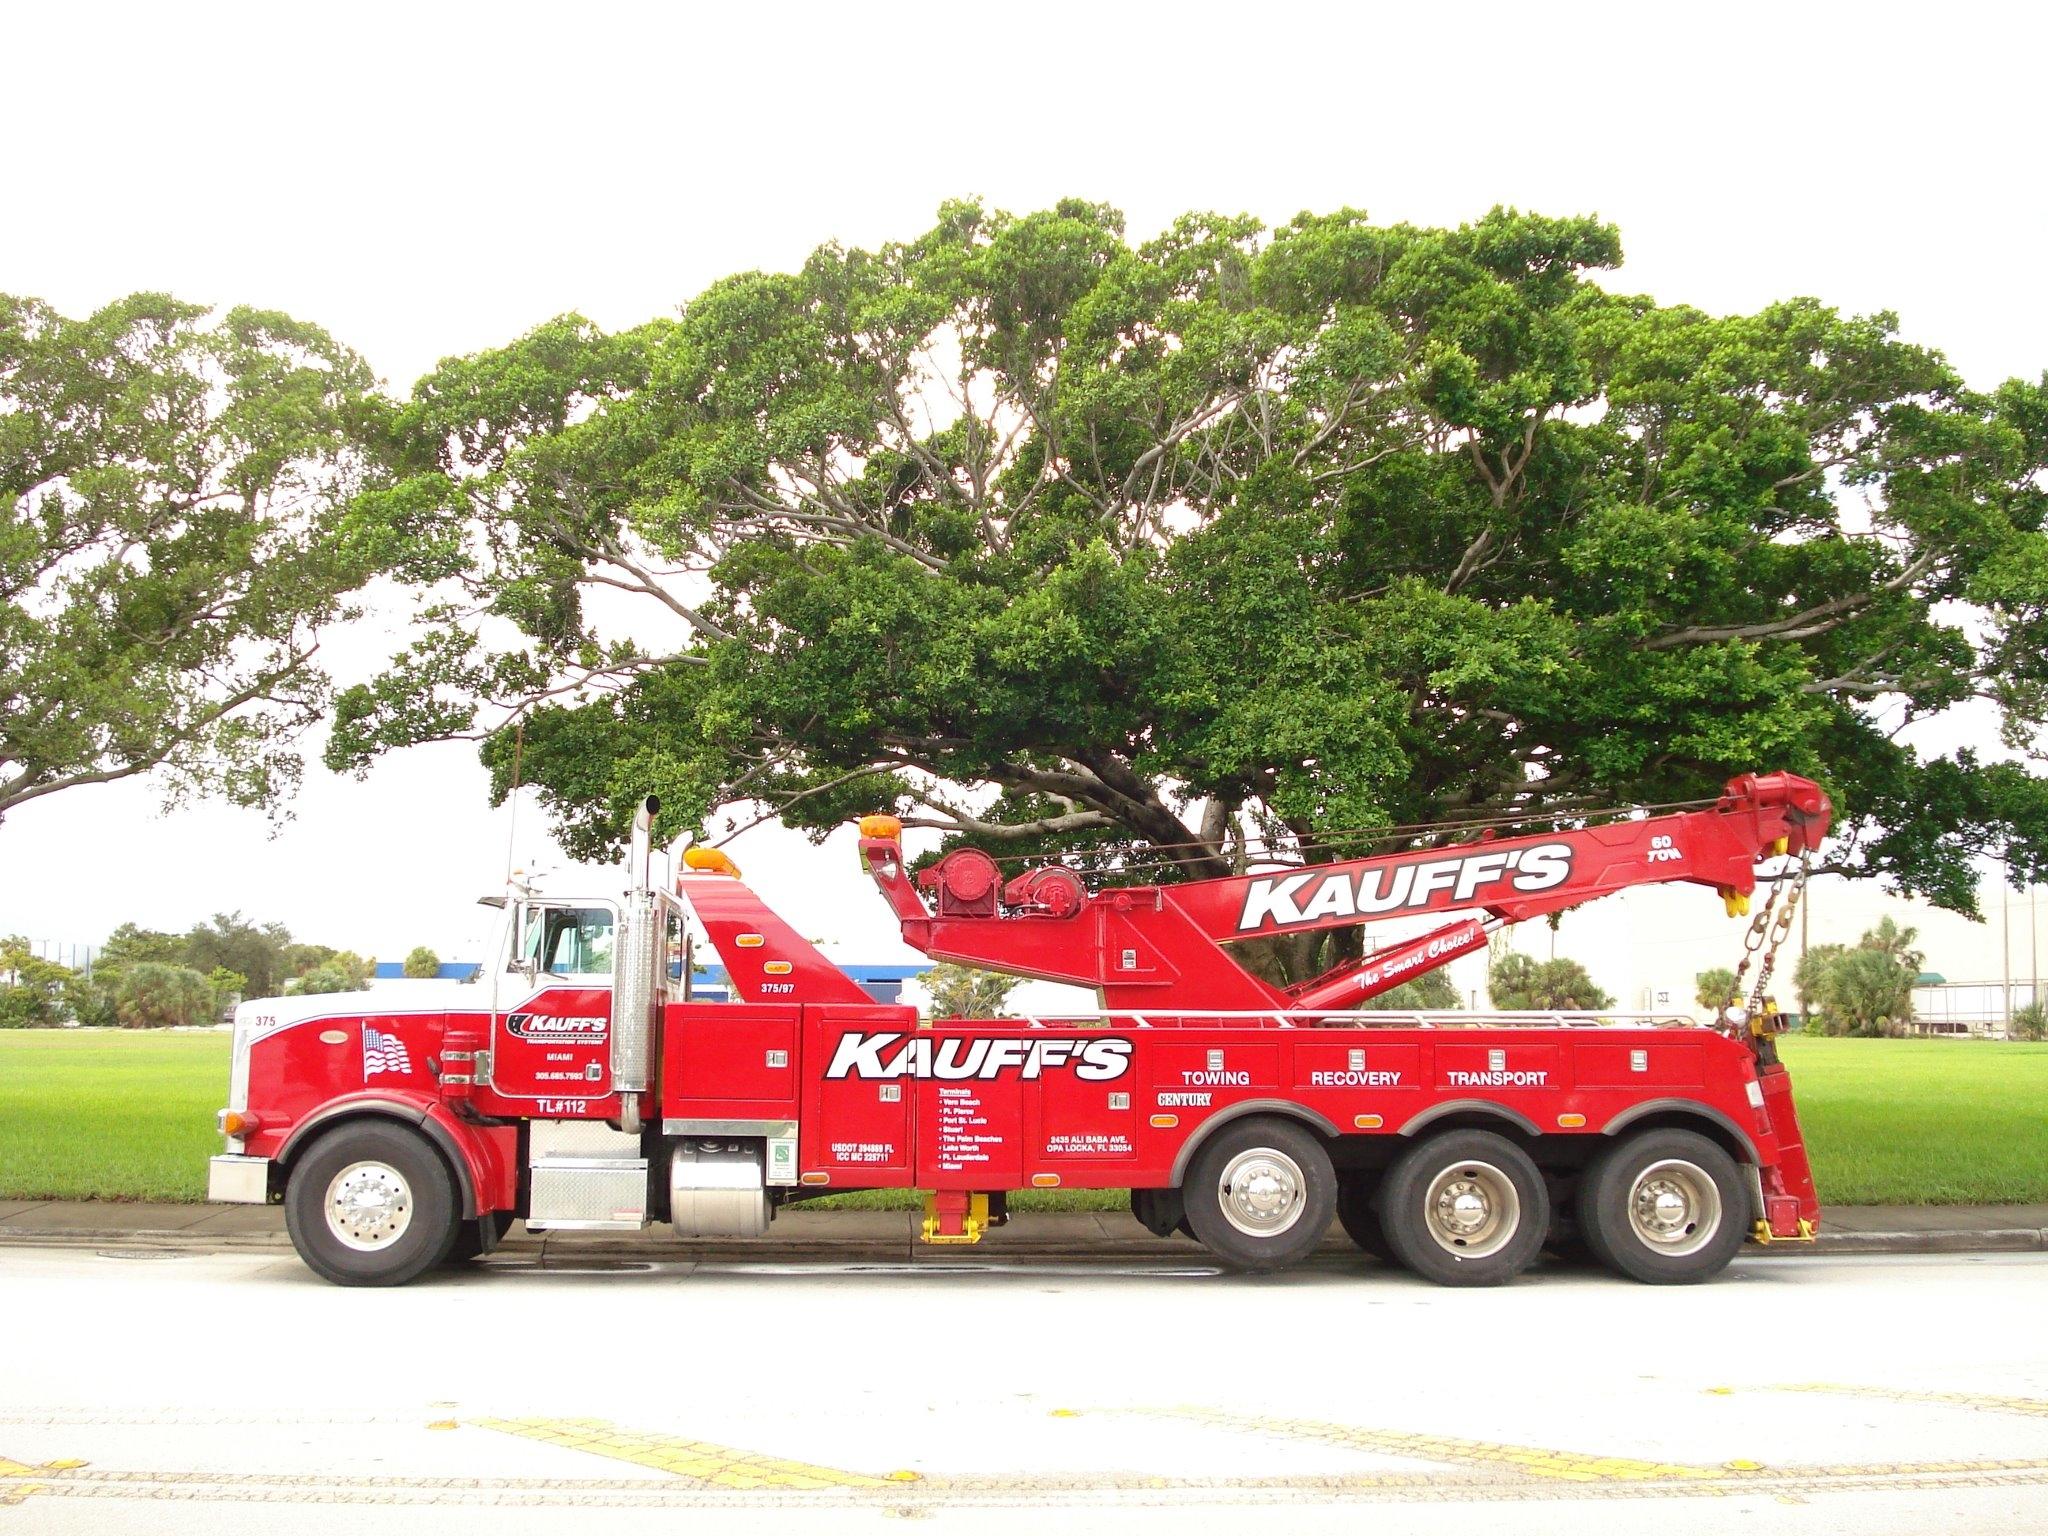 Kauff's Transportation Systems image 4